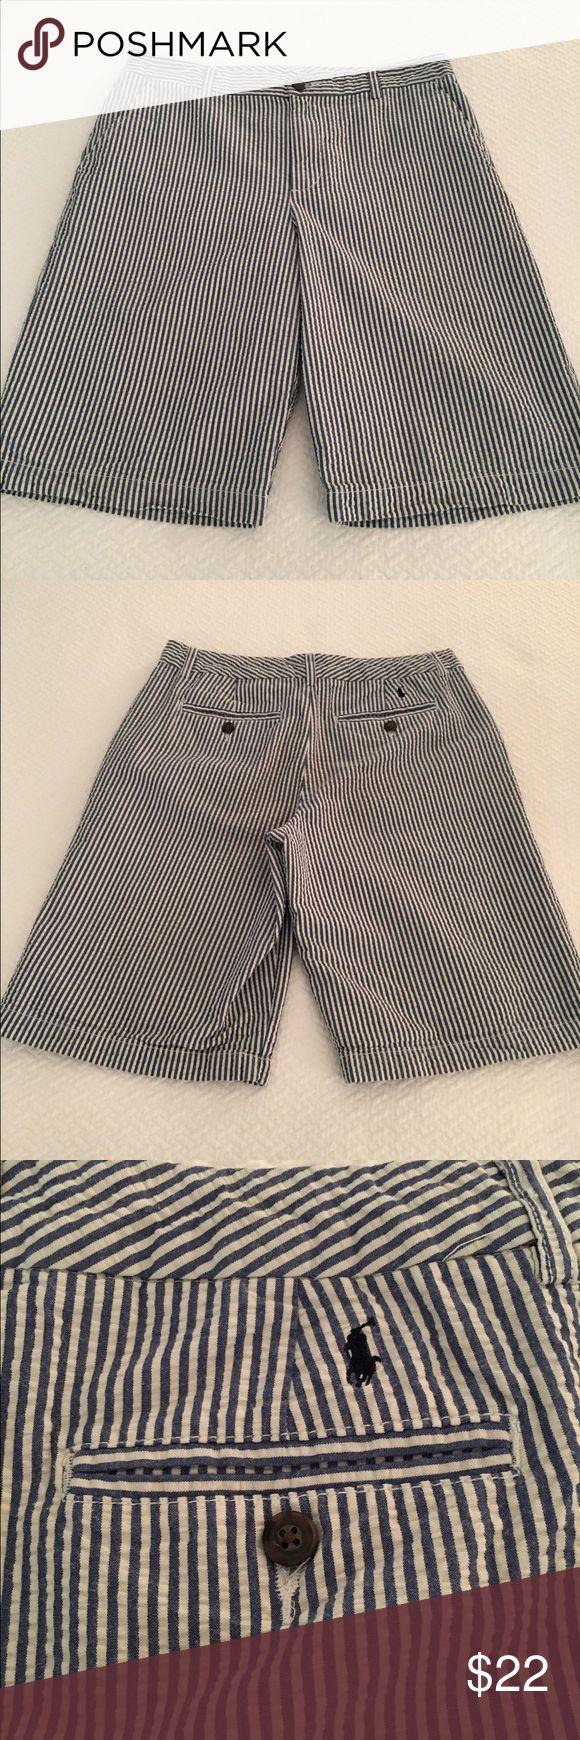 Polo by Ralph Lauren seersucker shorts Blue and white striped, flat front, seersucker shorts - in excellent condition! Polo by Ralph Lauren Bottoms Shorts